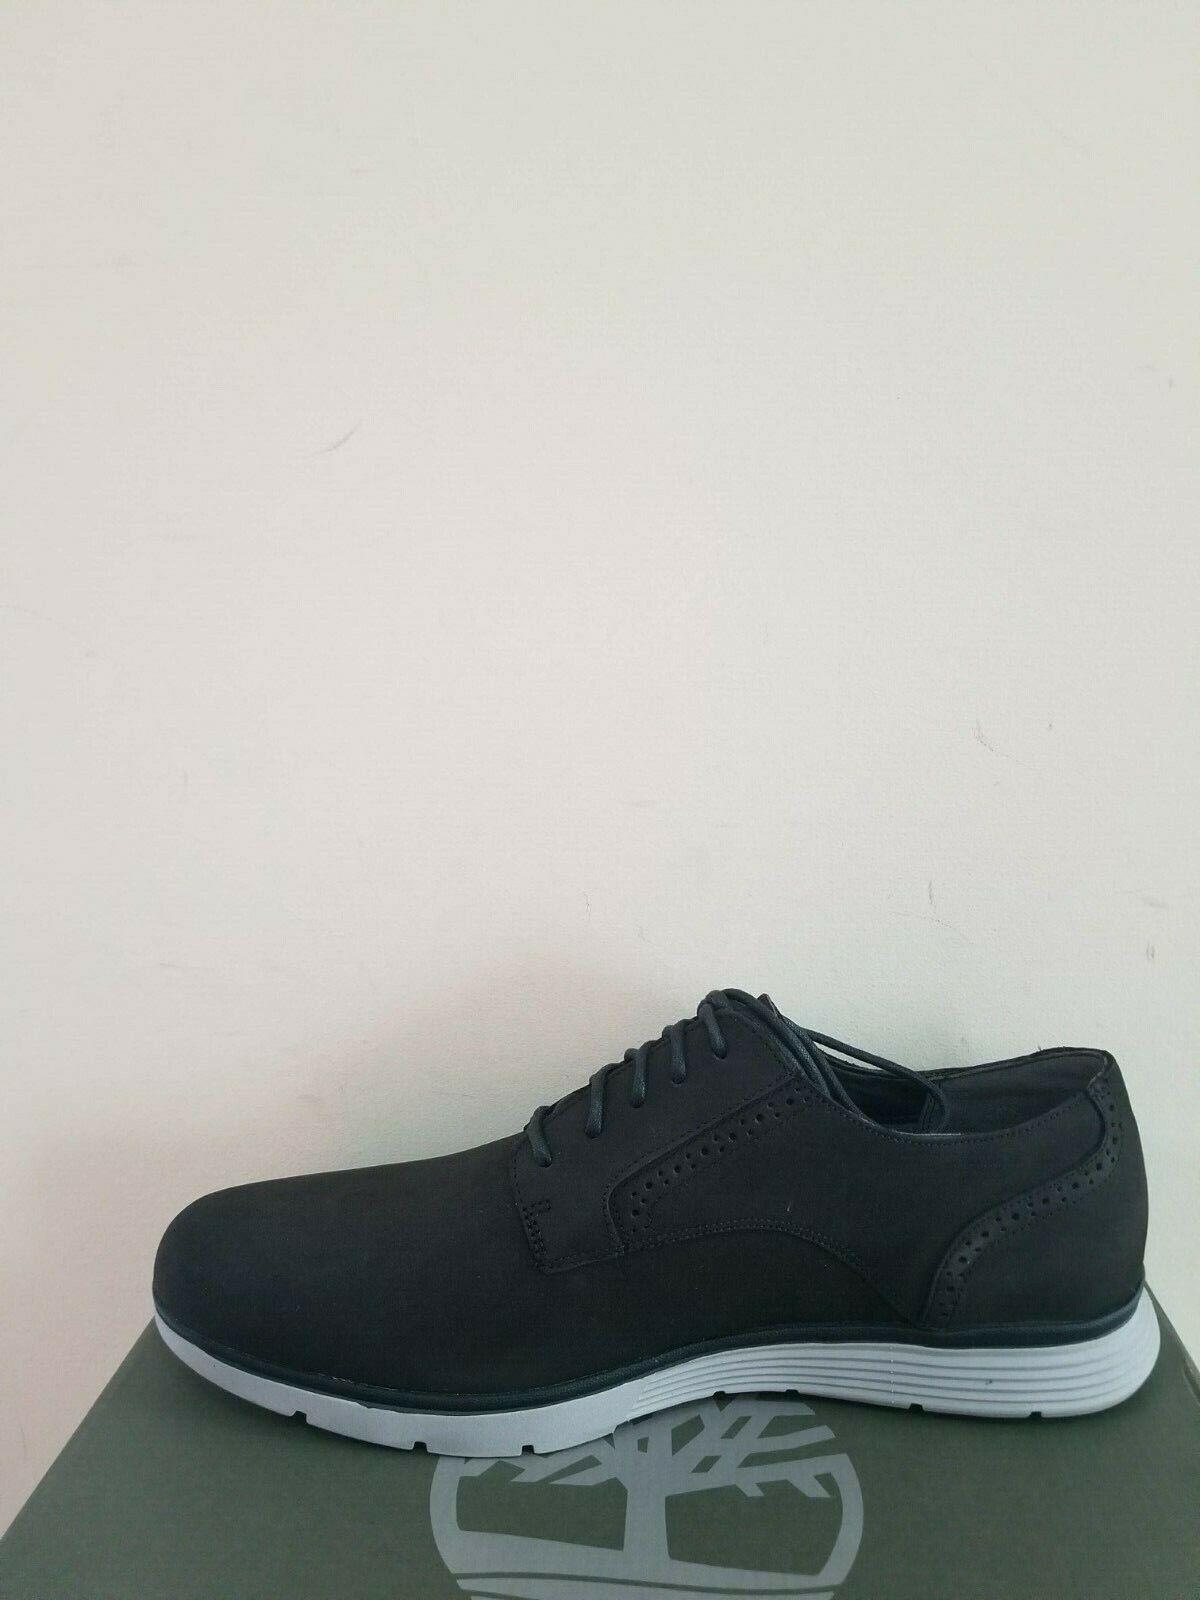 Timberland Men's  Franklin  Park Brogue Oxford Shoes NIB 1